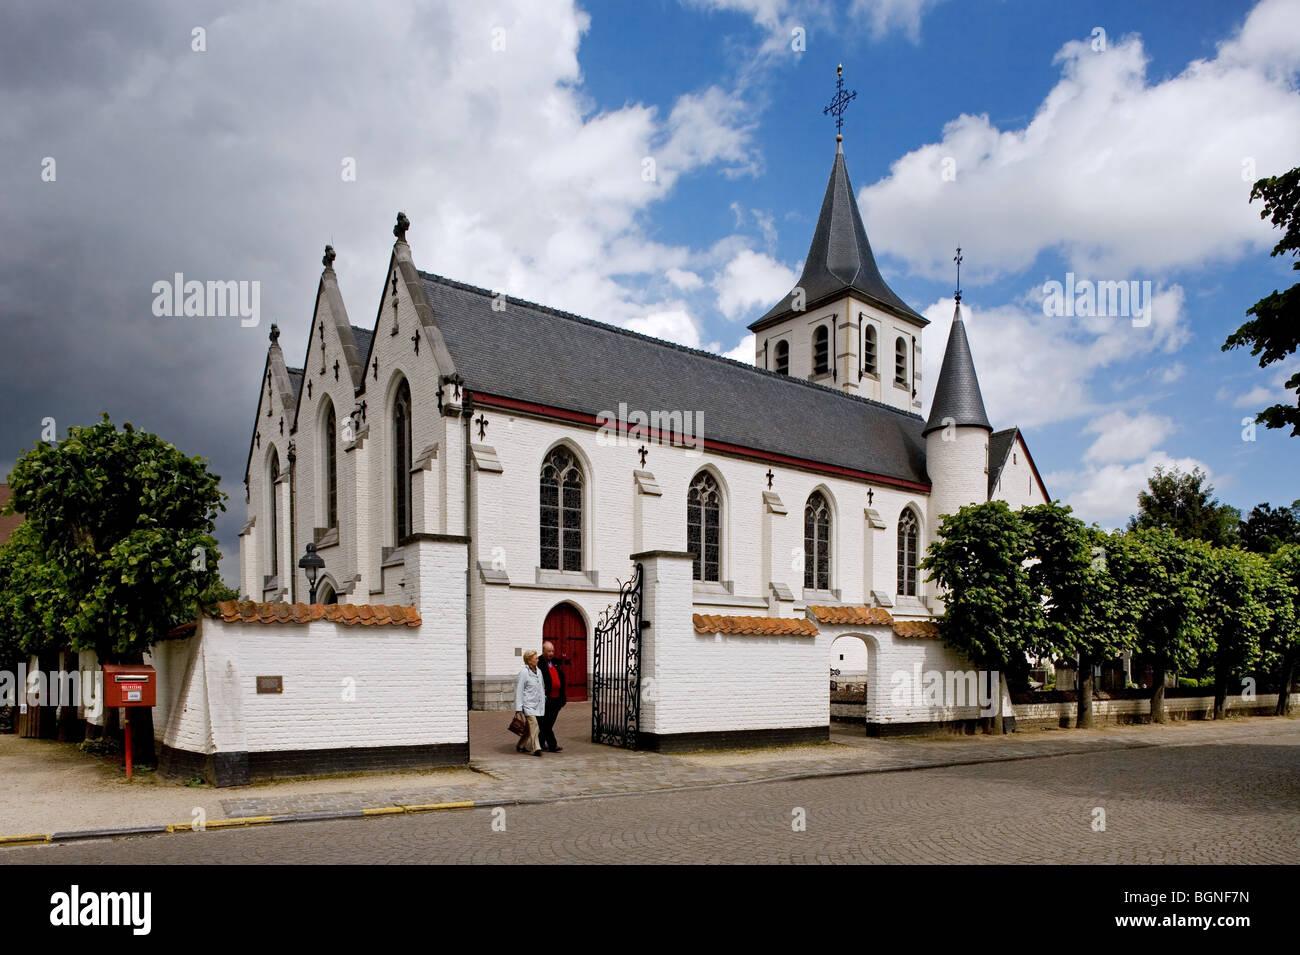 The Sint-Martinus church, Sint-Martens-Latem, Belgium - Stock Image